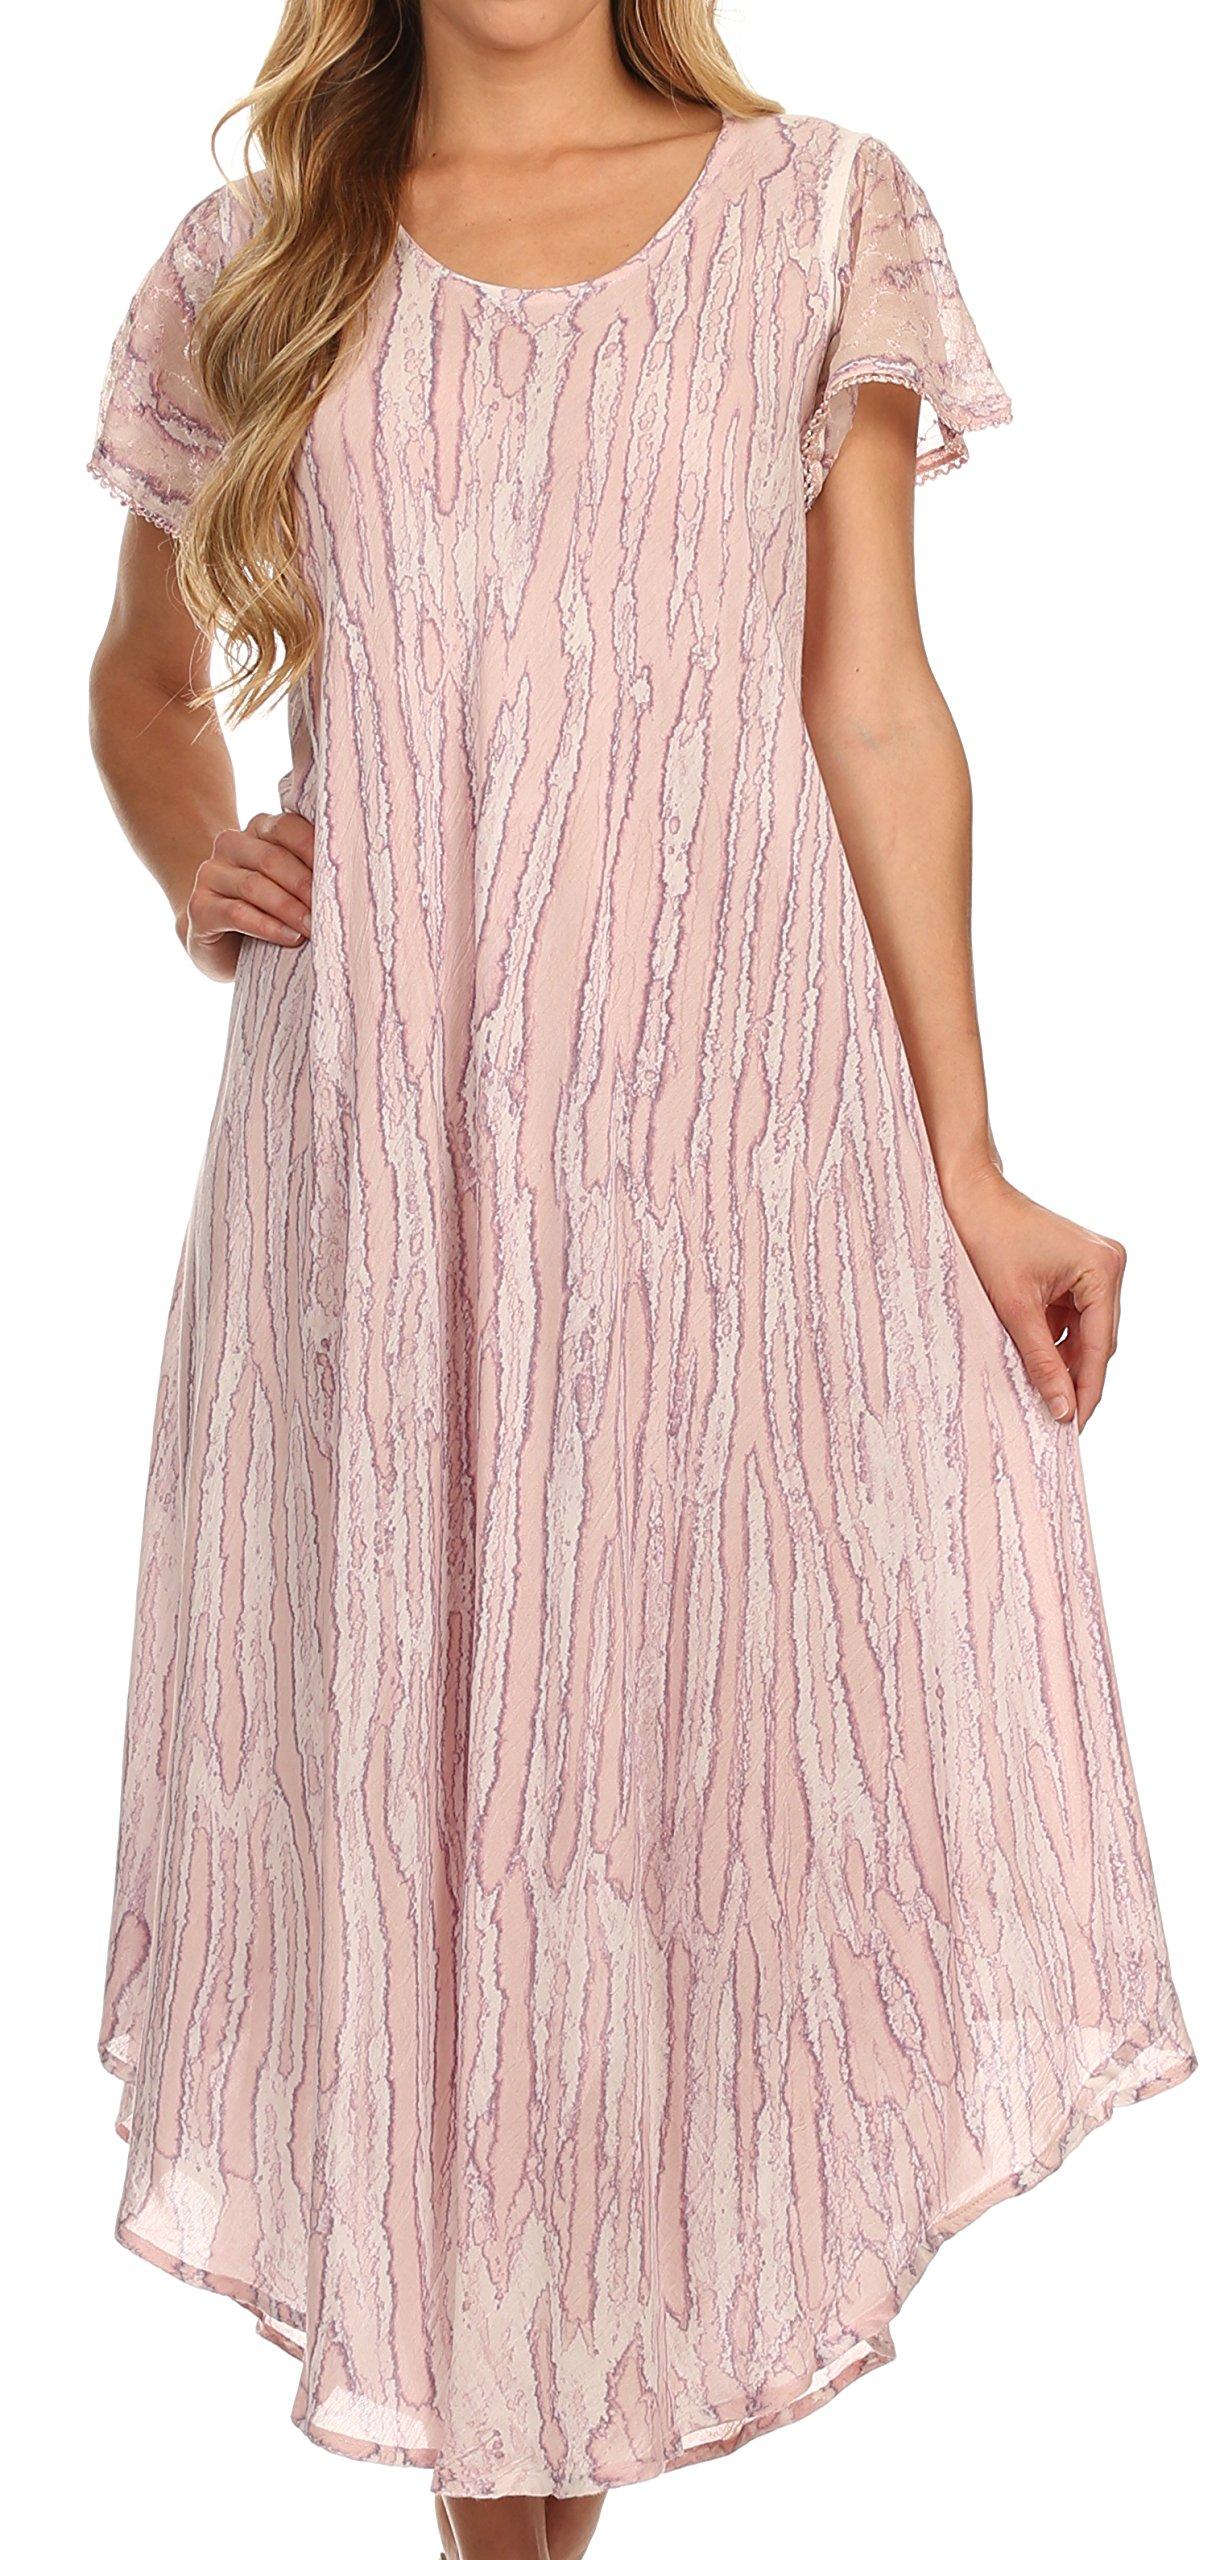 Sakkas 14802 - Faye Cap Sleeved Cotton Caftan Cover Up Dress - Violet - OS